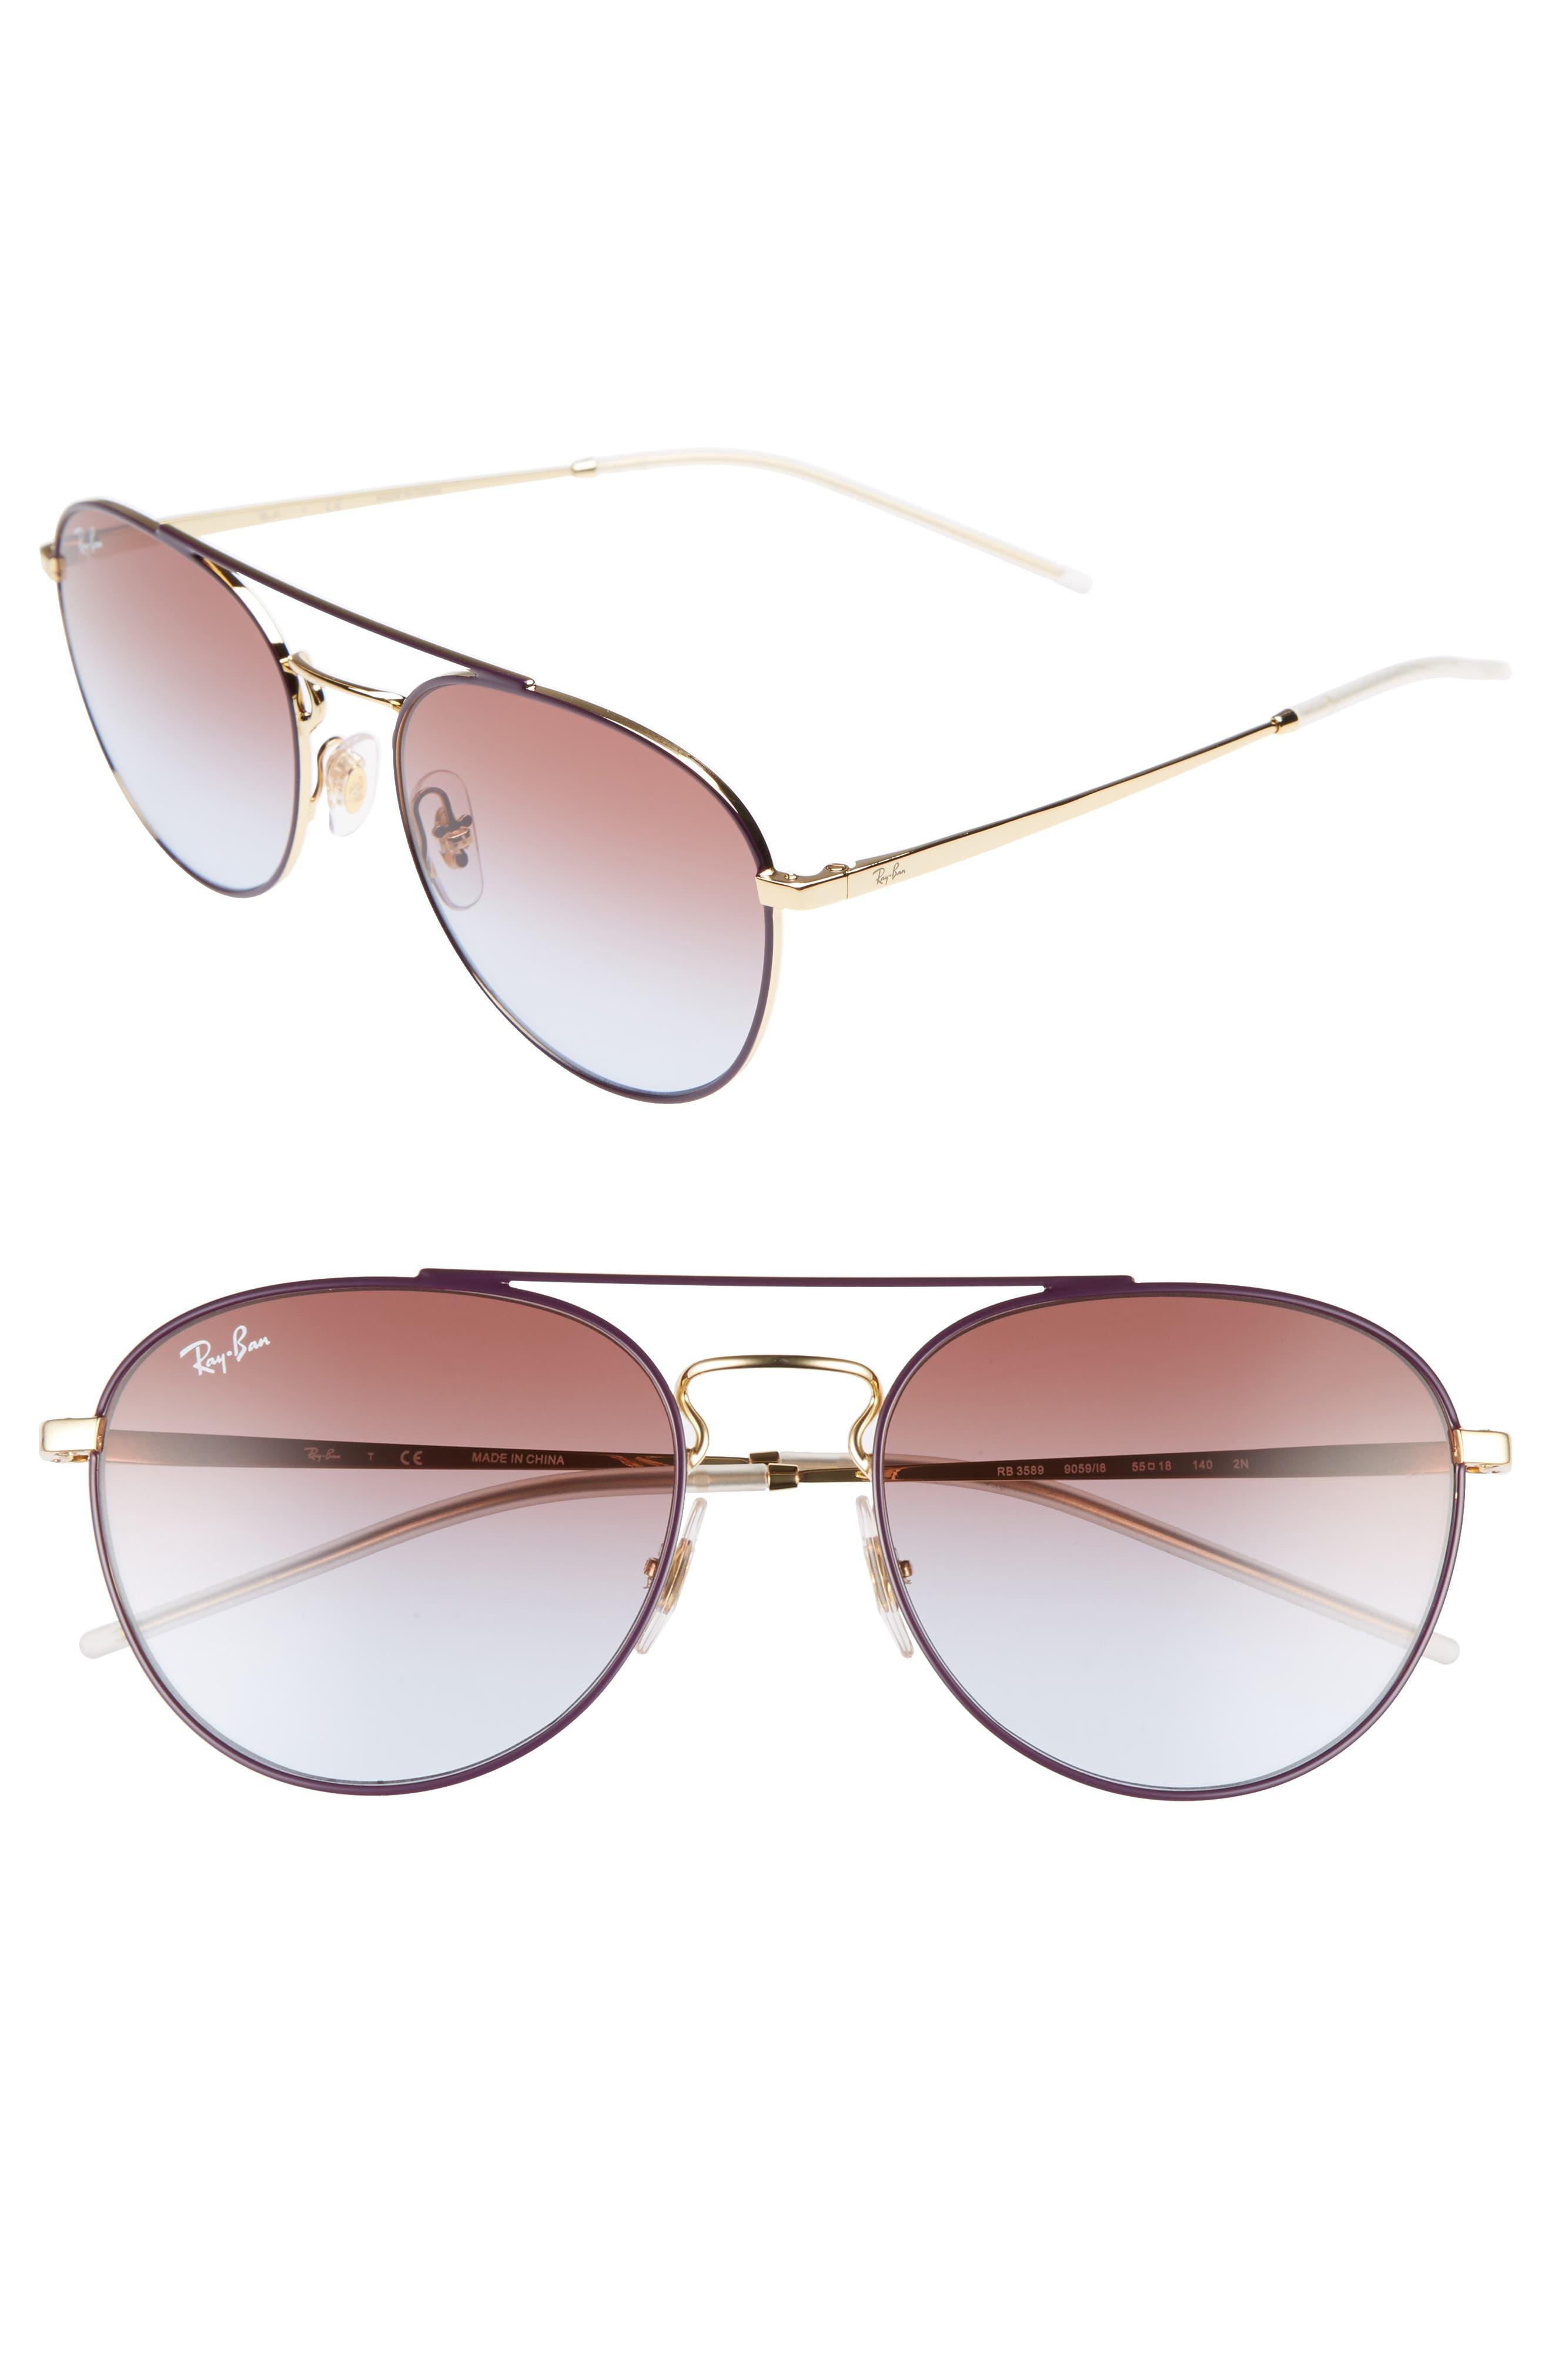 Main Image - Ray-Ban 55mm Gradient Lens Round Aviator Sunglasses